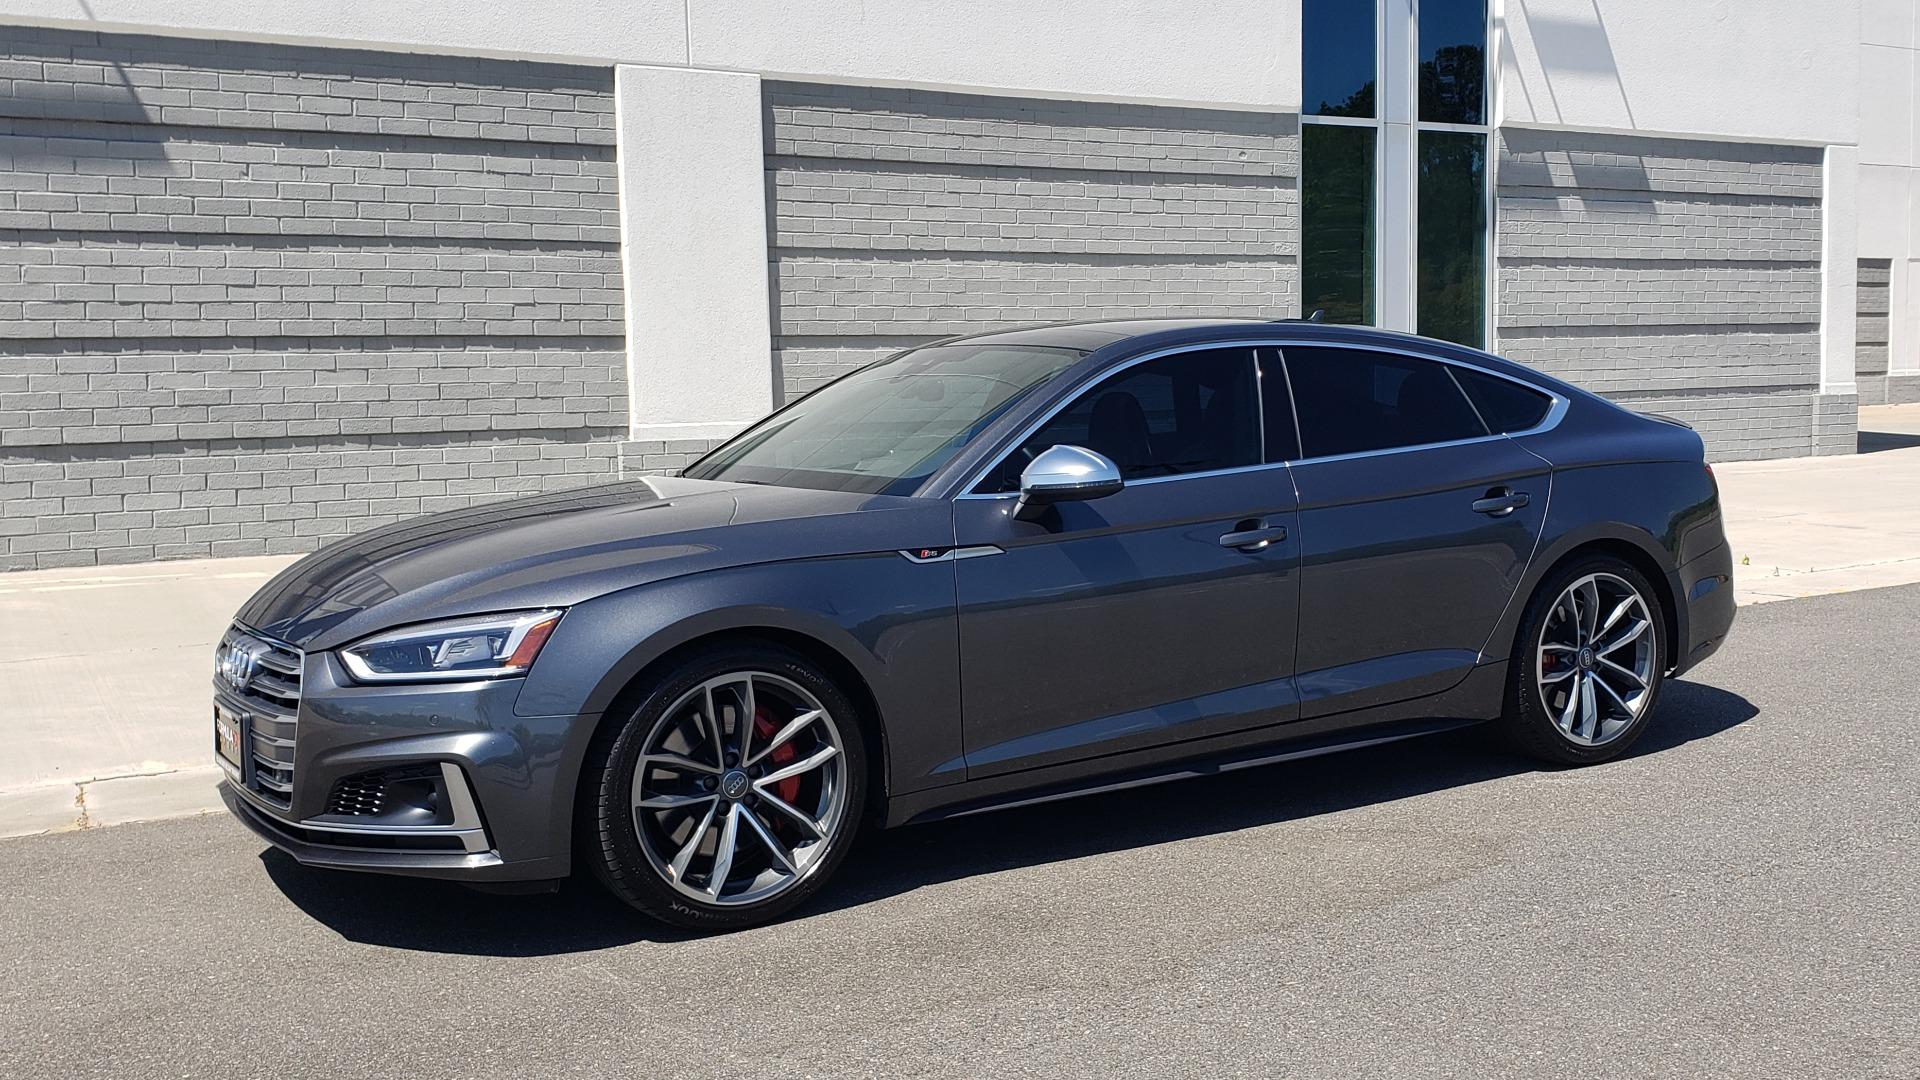 Used 2018 Audi S5 SPORTBACK PRESTIGE S-SPORT / NAV / SUNROOF / HUD / B&O SND / REARVIEW for sale $48,995 at Formula Imports in Charlotte NC 28227 3